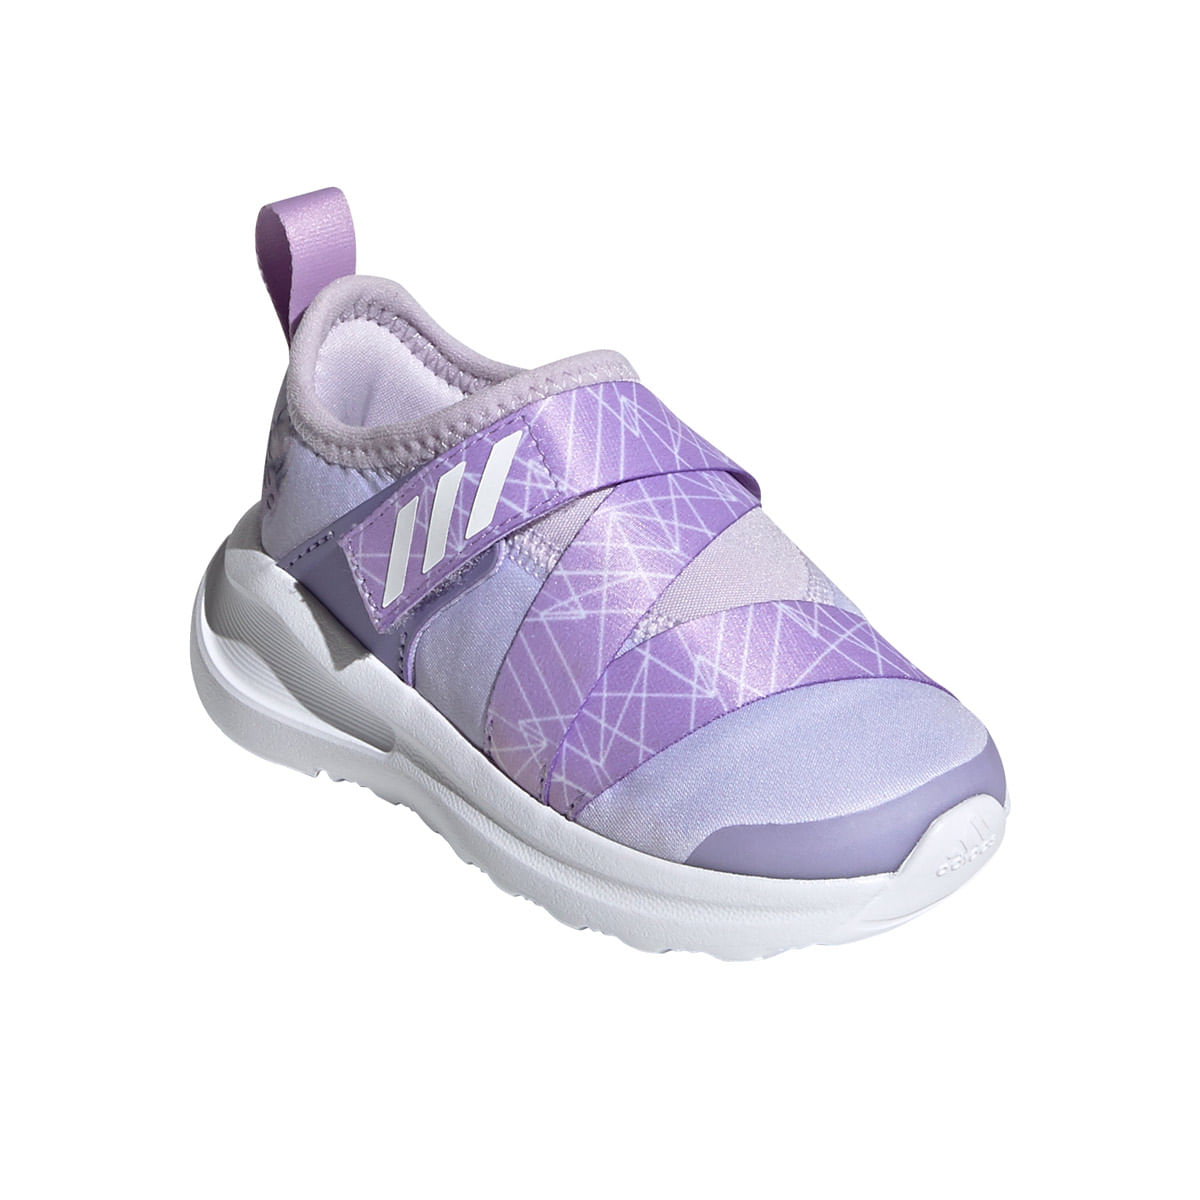 Tenis-Infantil-Adidas-FortaRun-X-Frozen--18-ao-25-